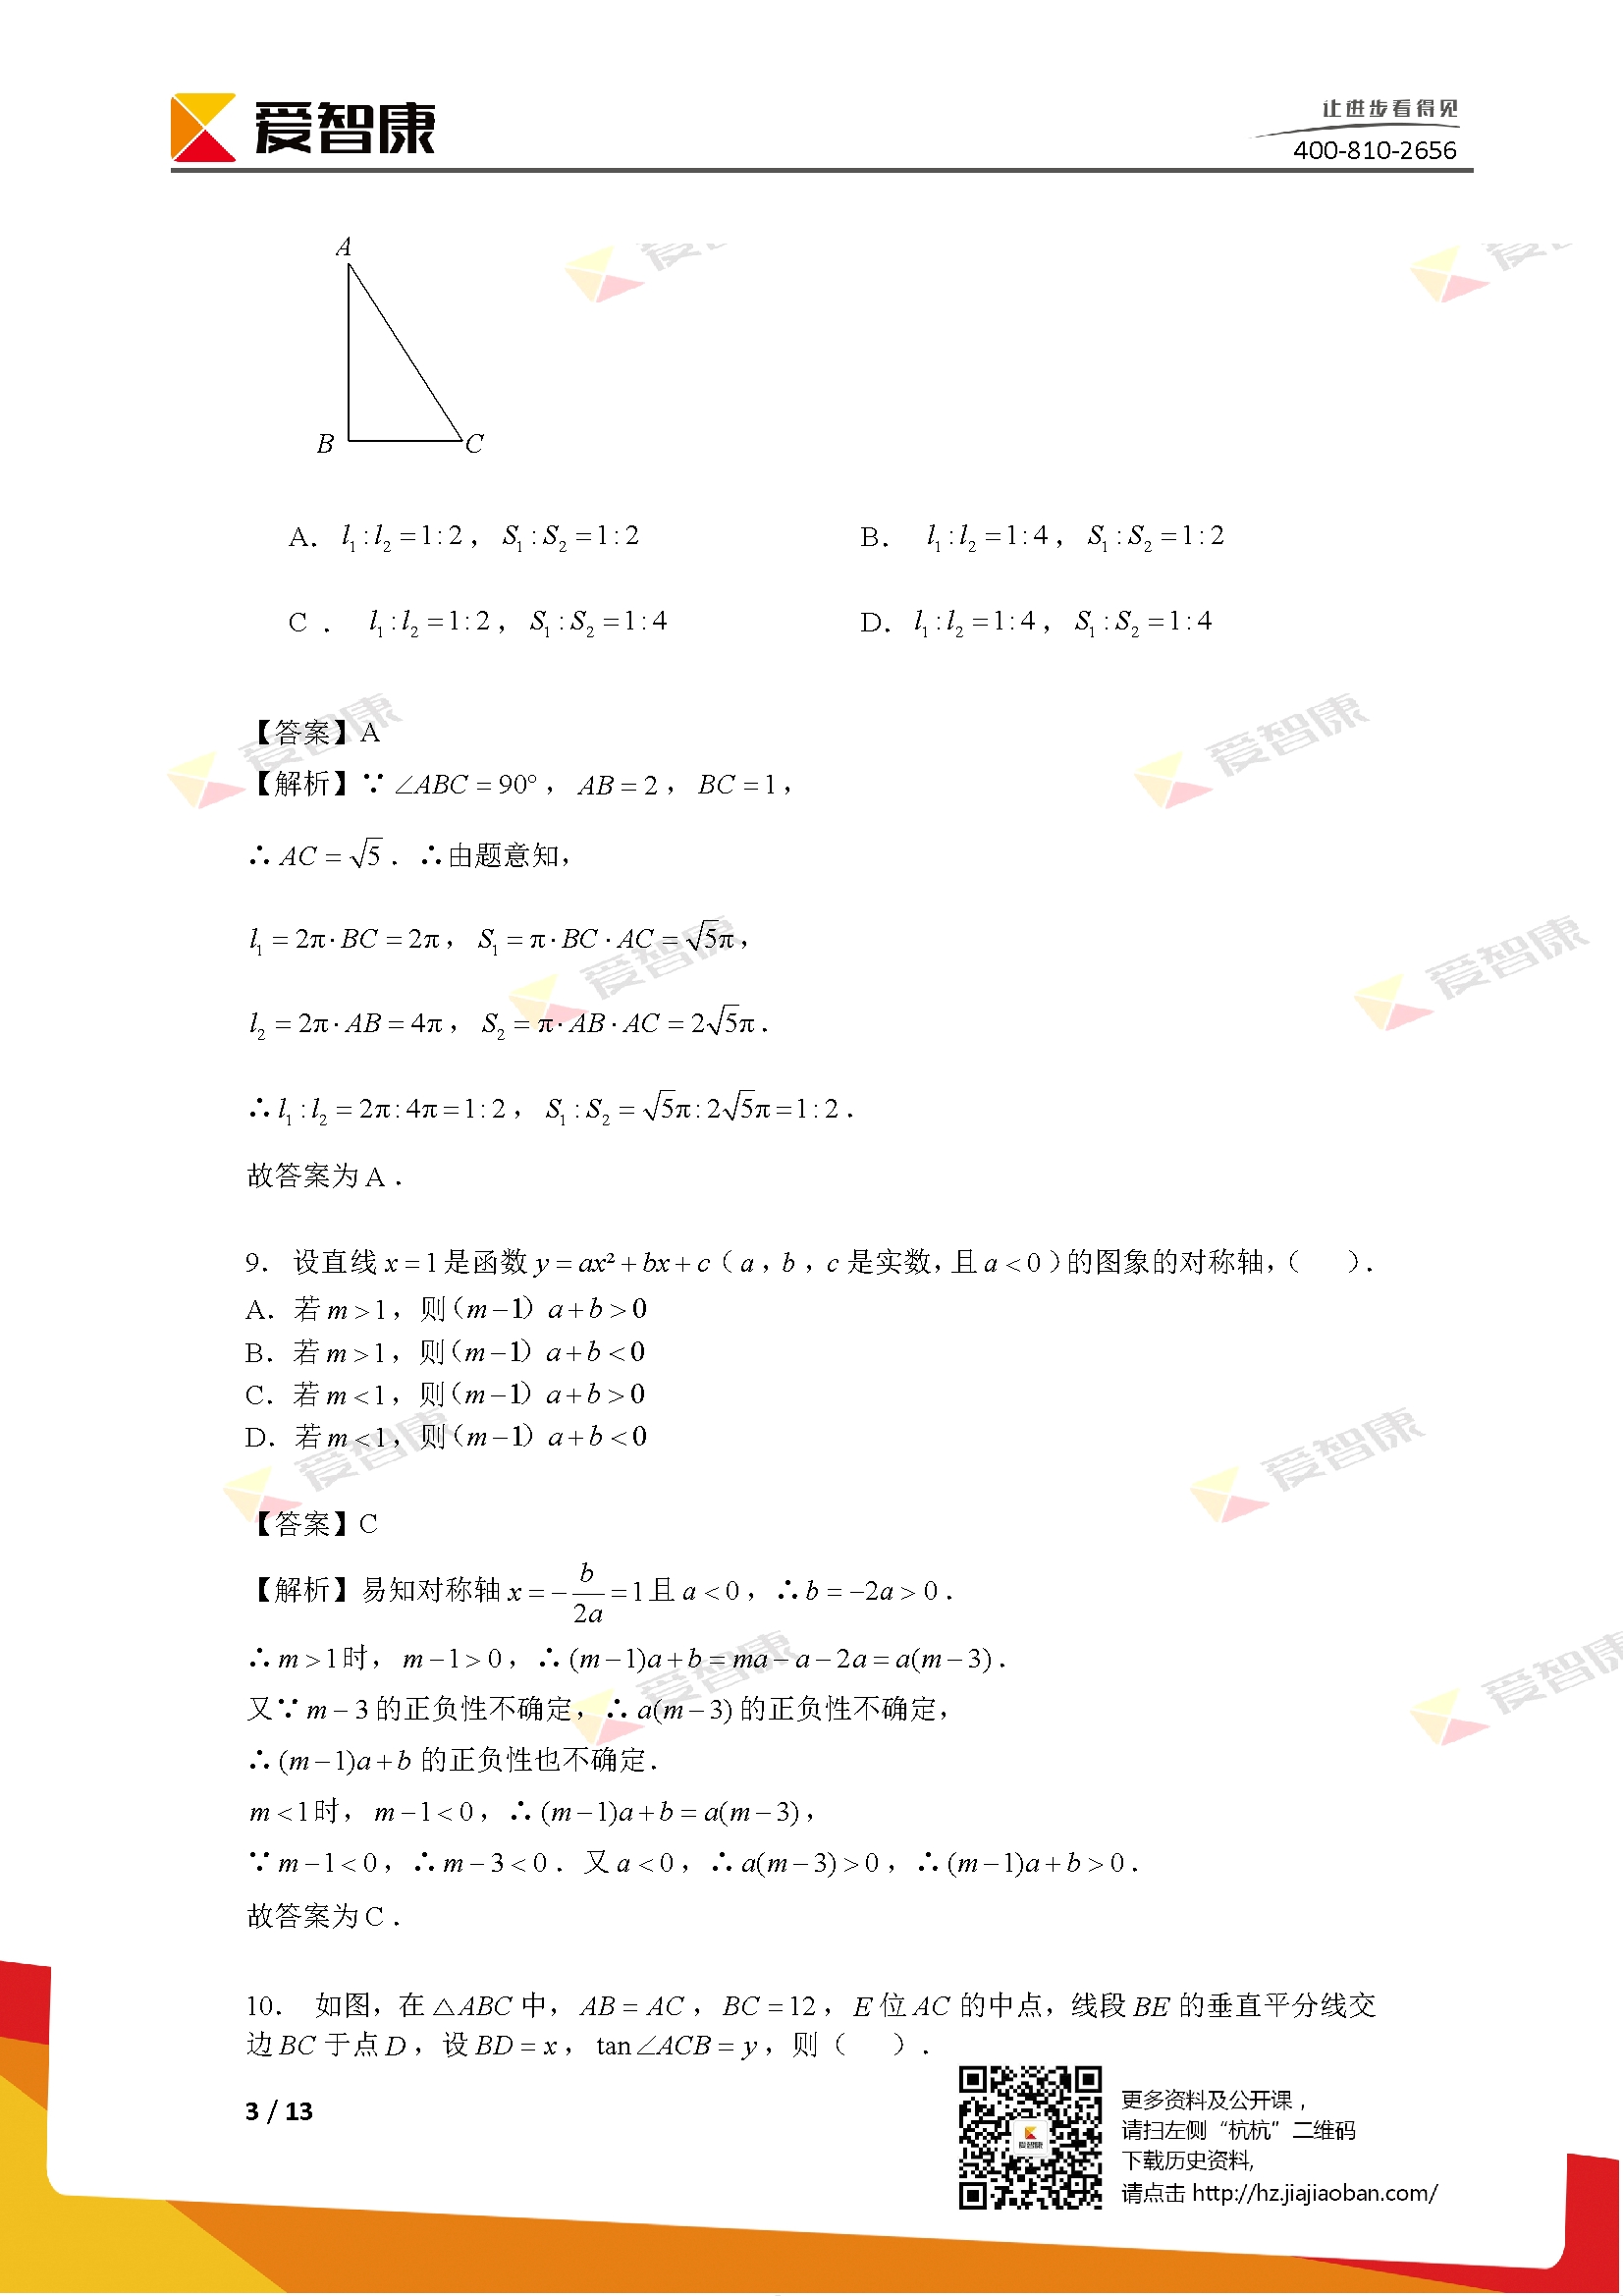 Microsoft Word - 2017年杭州市中考数学试卷解析23.jpg